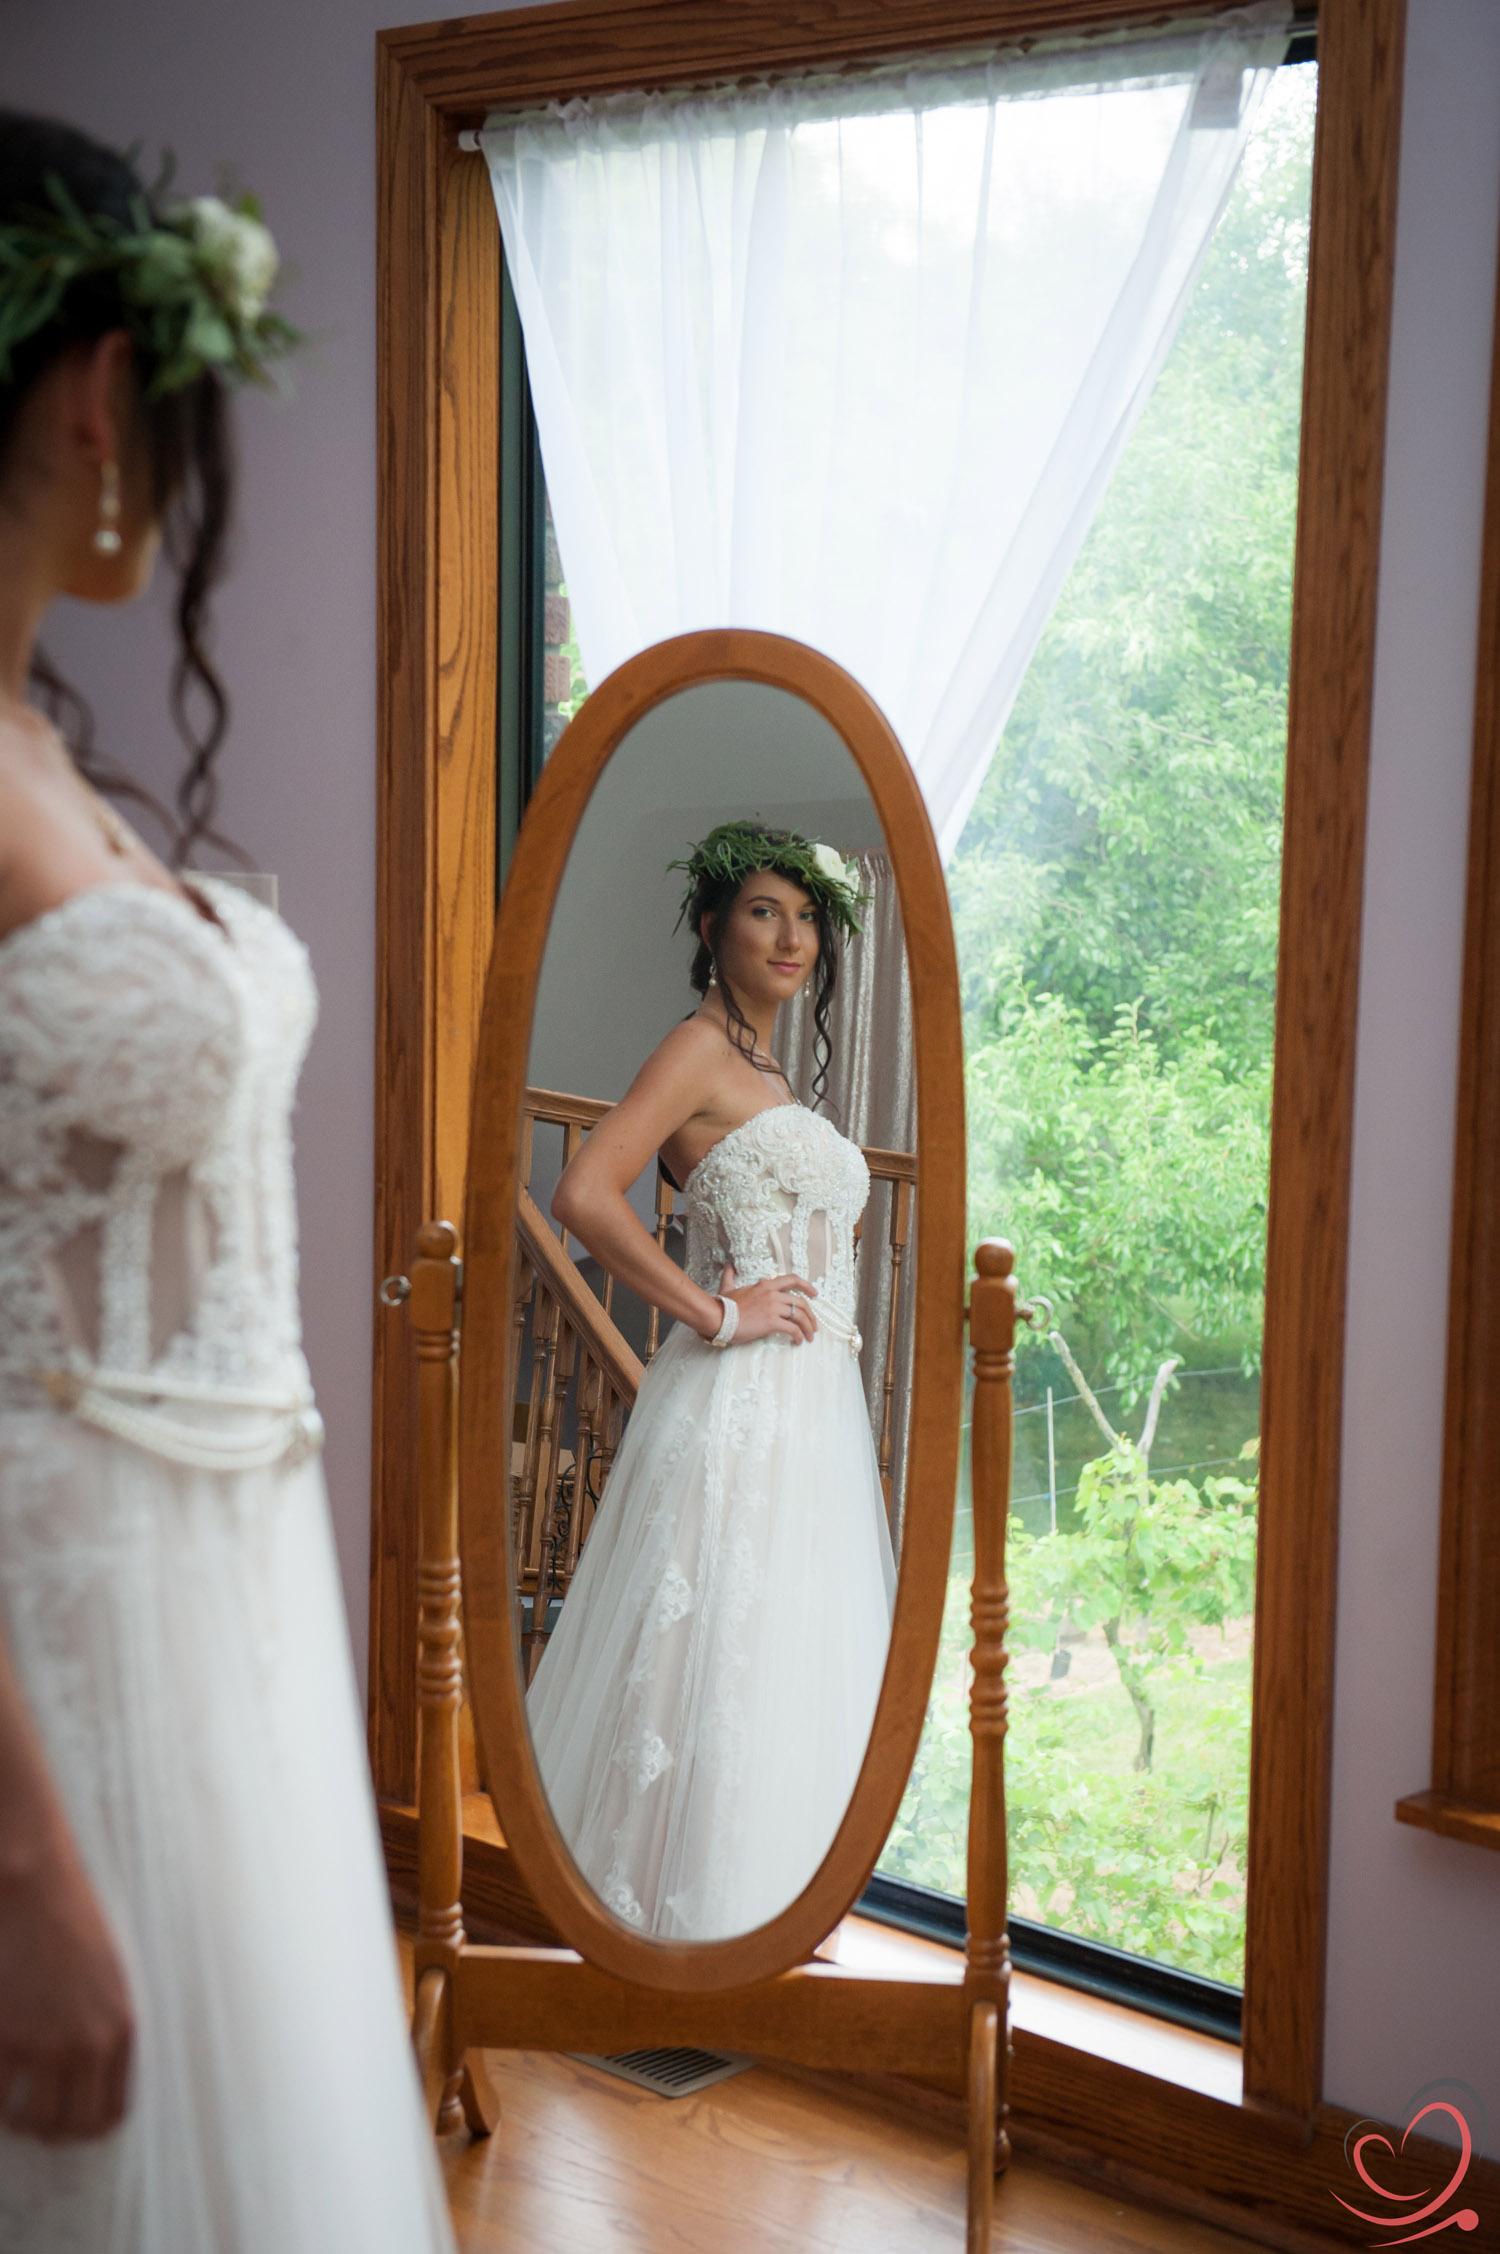 Mallinson Stylized Shoot Bride Getting Ready for the Wedding.jpg